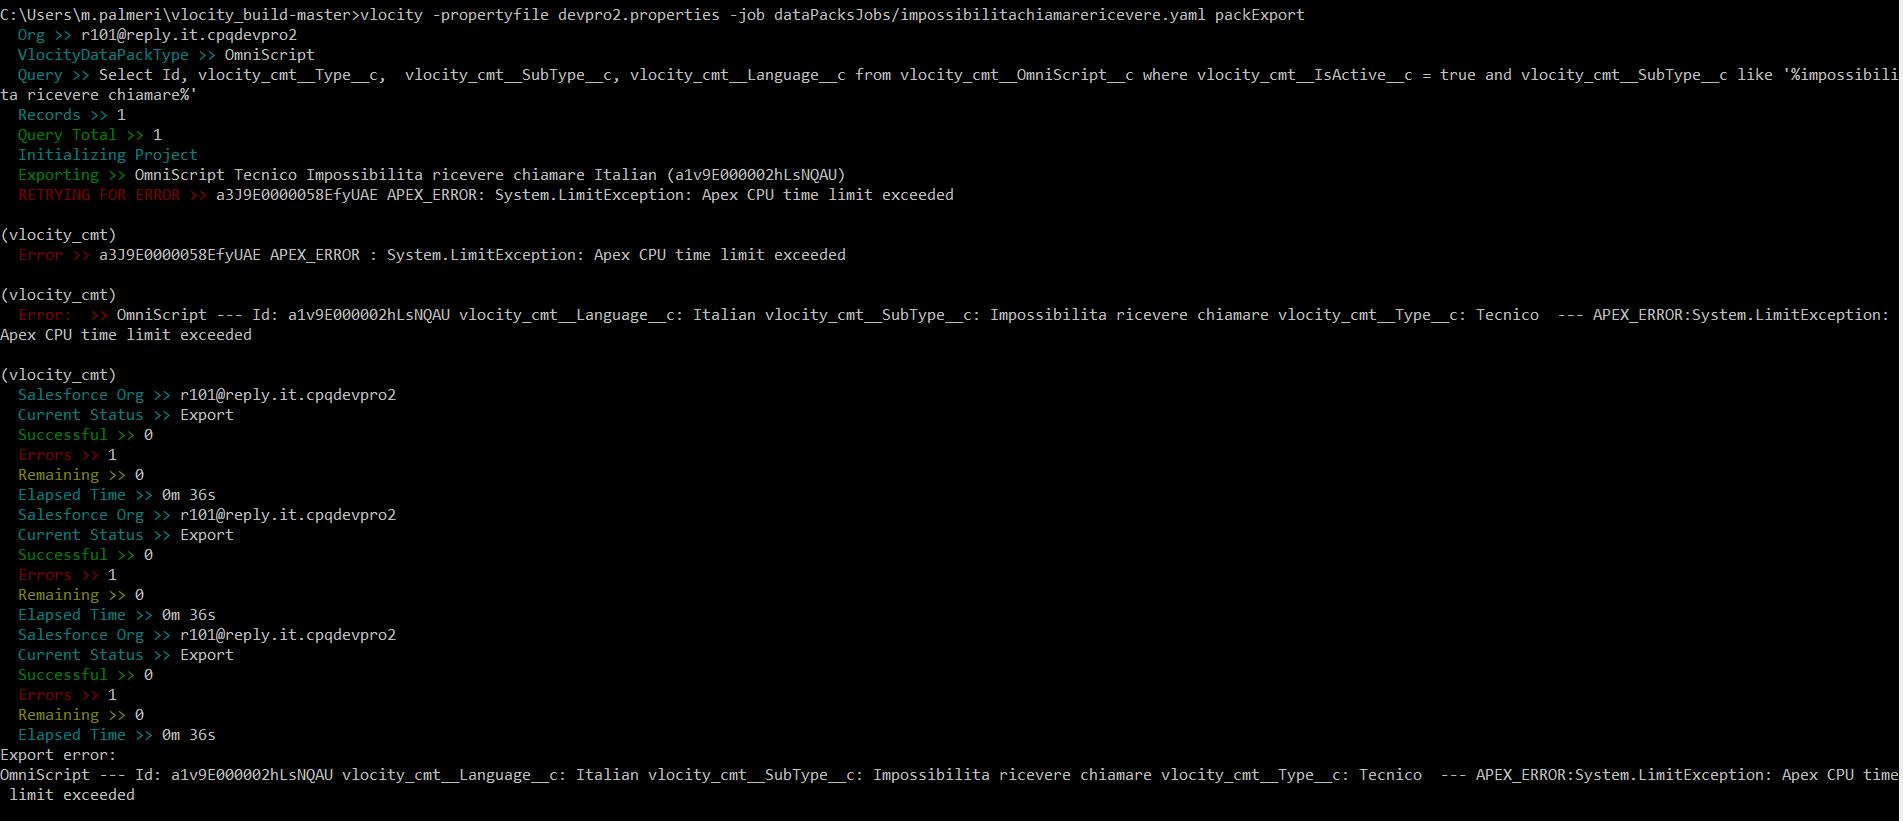 APEX_ERROR : System LimitException: Apex CPU time limit